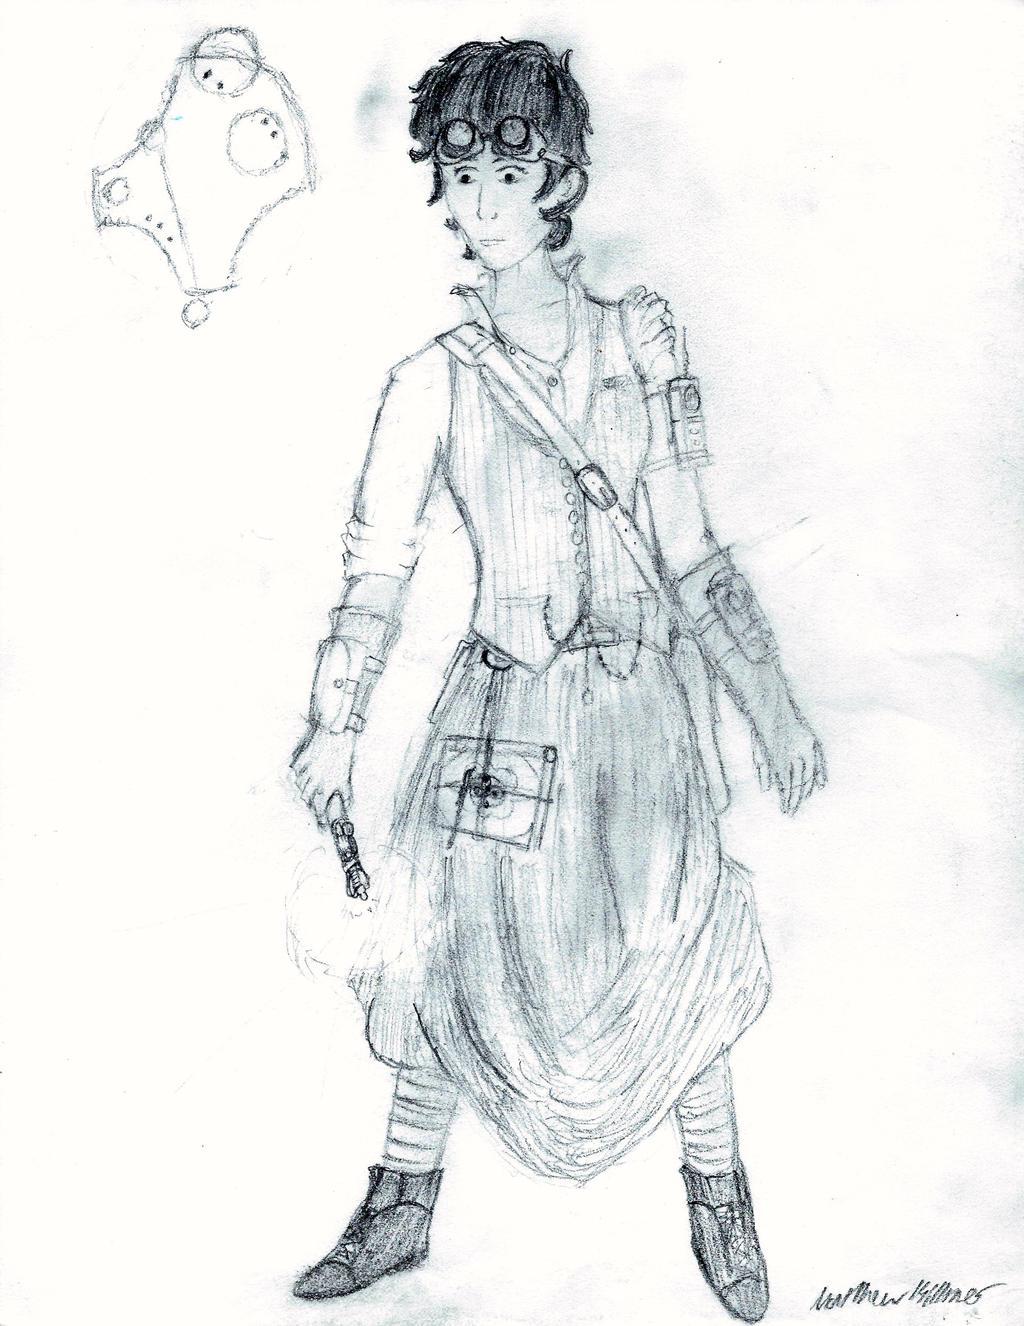 Steampunk Susan Foreman by holmesian1891